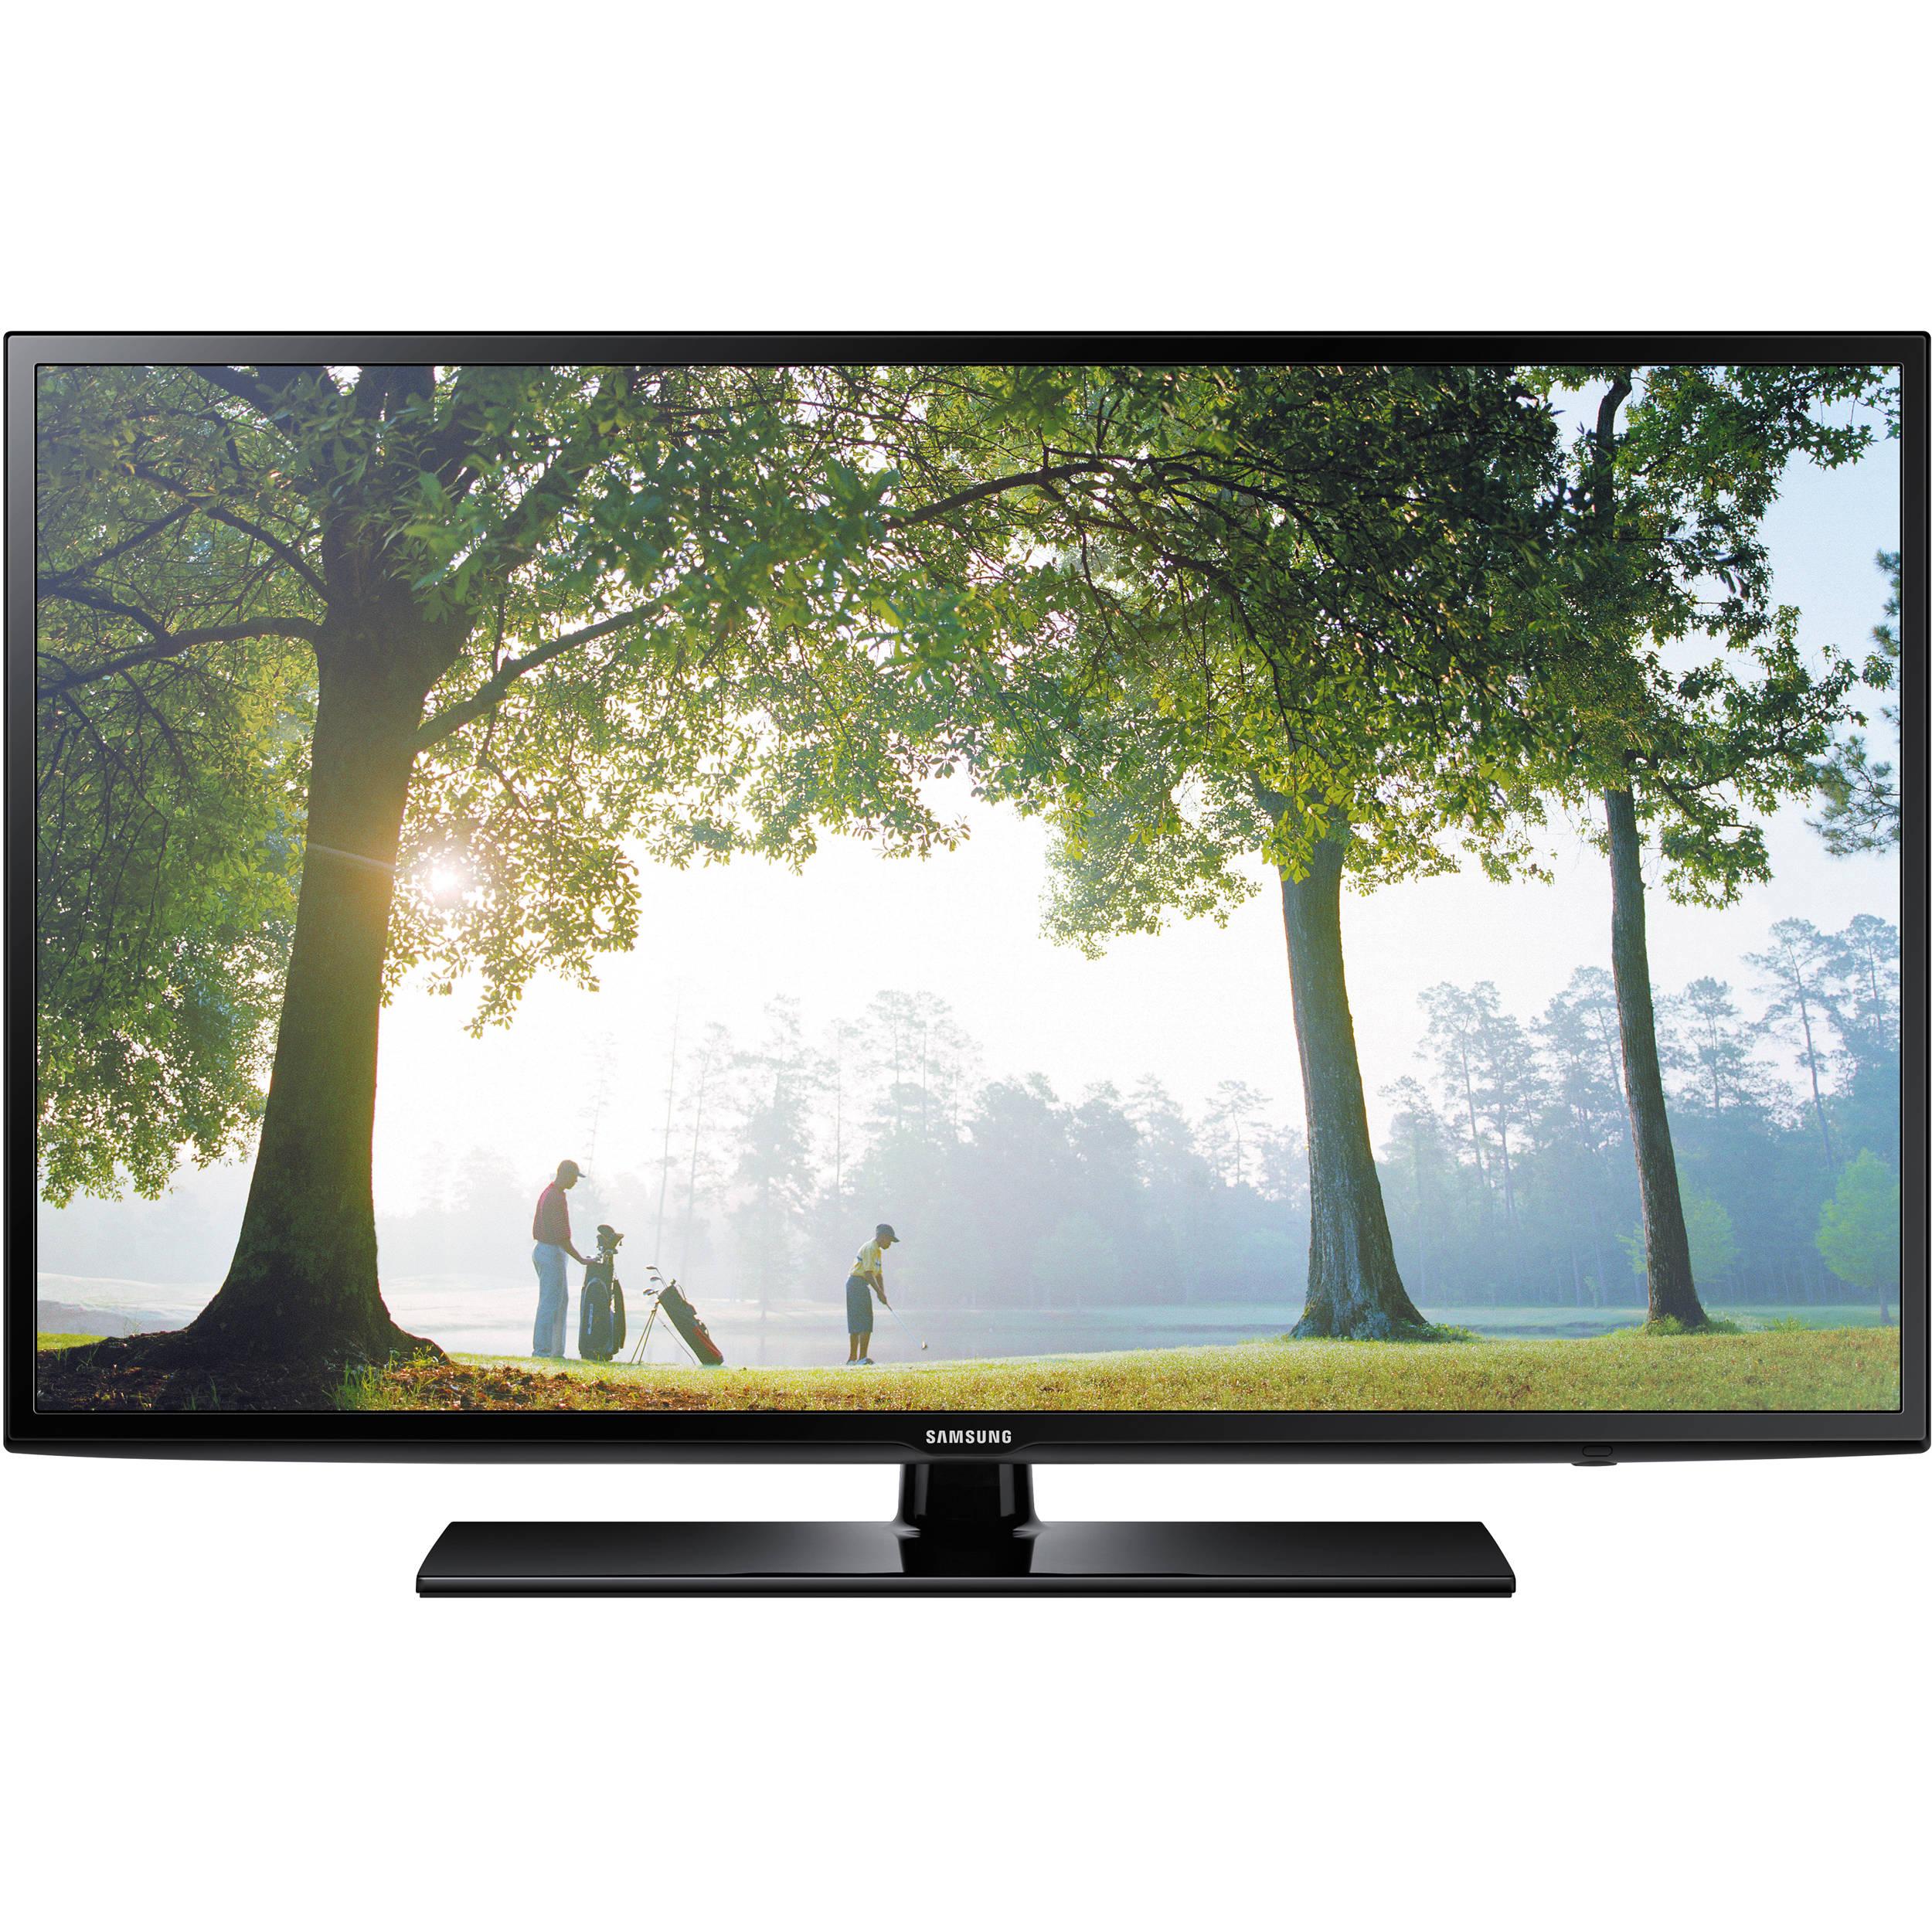 Hd Wallpaper Samsung Smart Tv